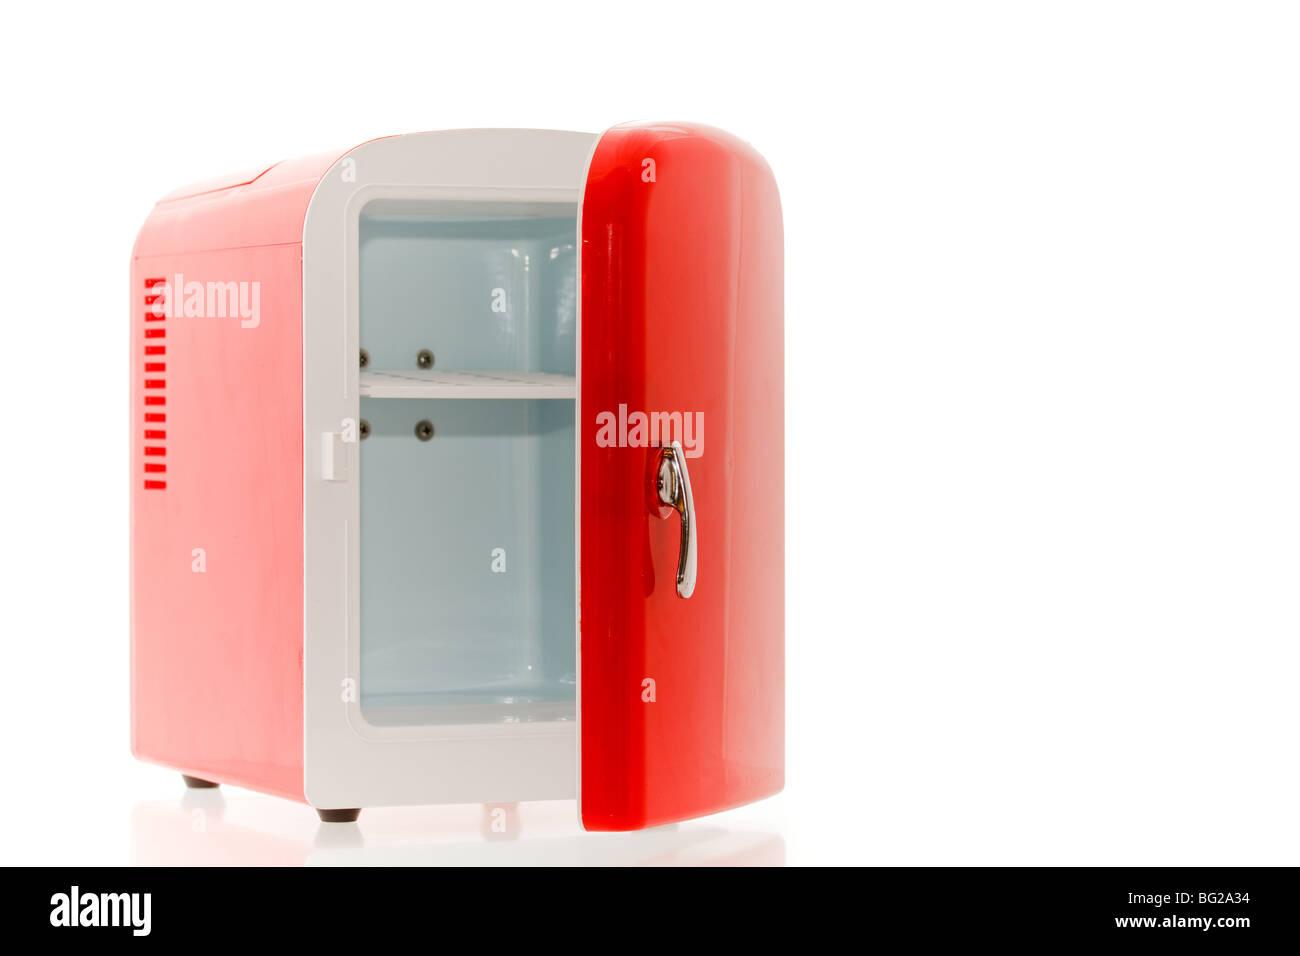 Red Bull Kühlschrank Folie : Kühlschrank rot magnetfolie din a zum beschriften und